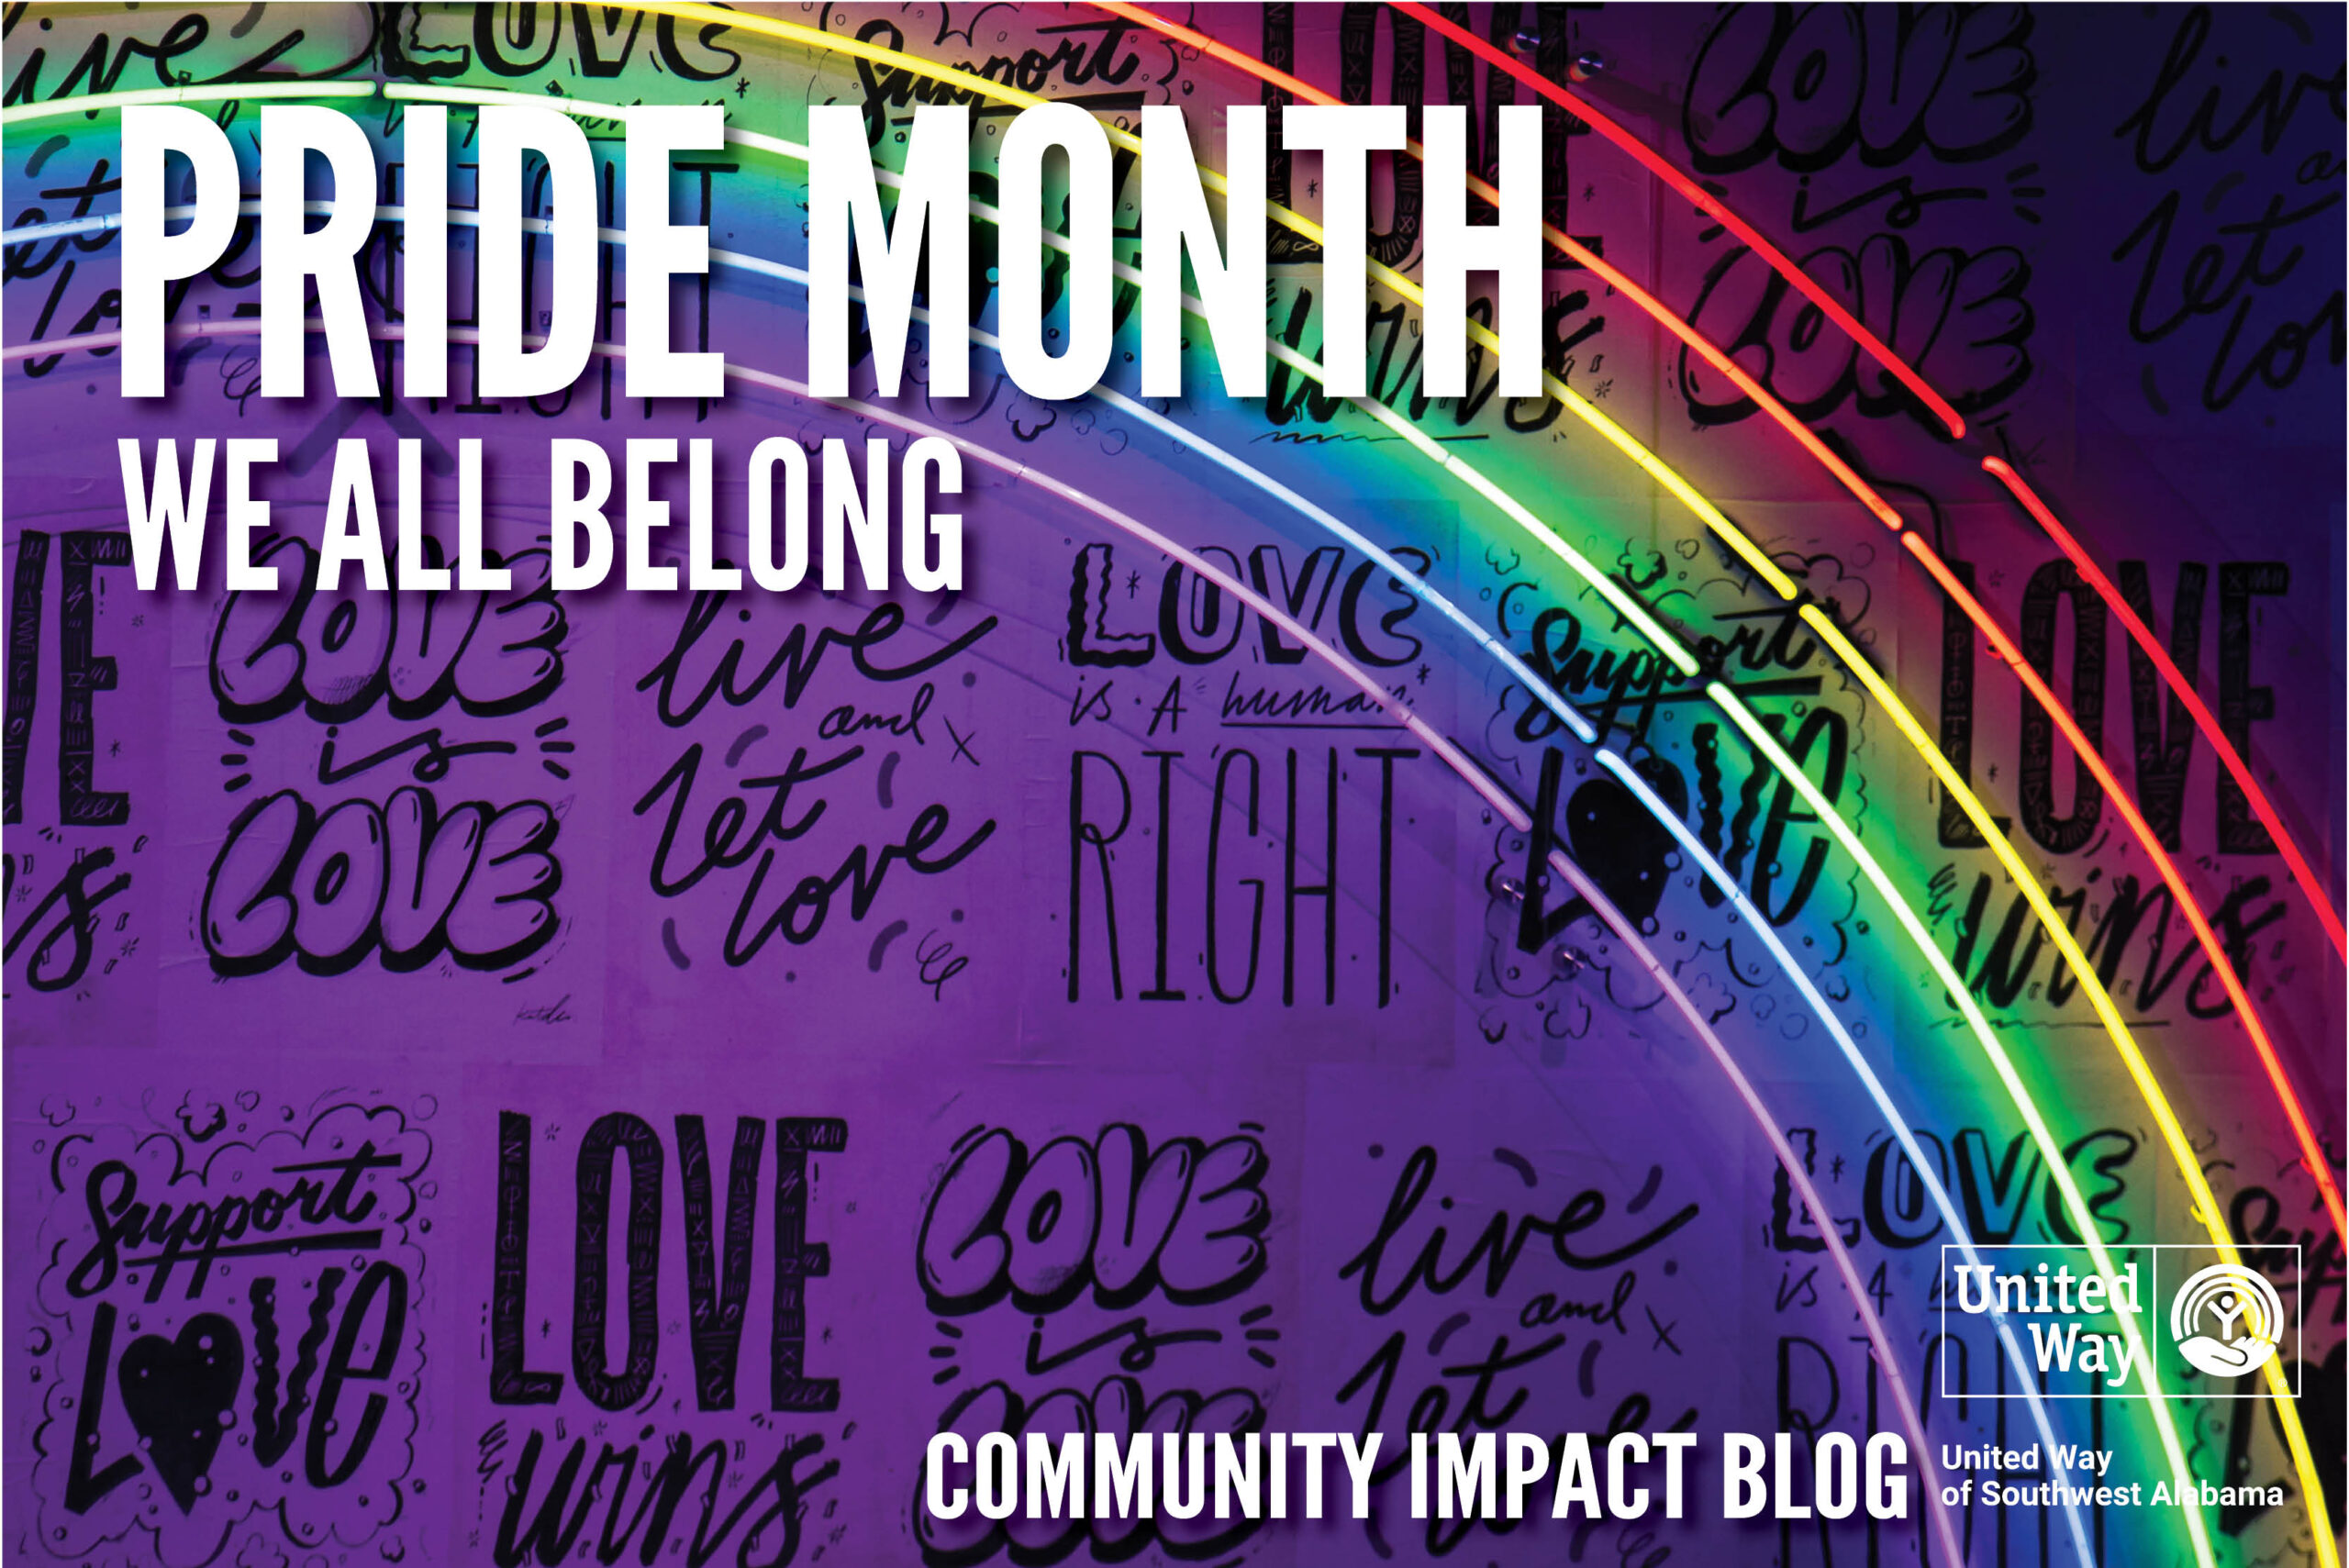 June 21 Community Impact Blog